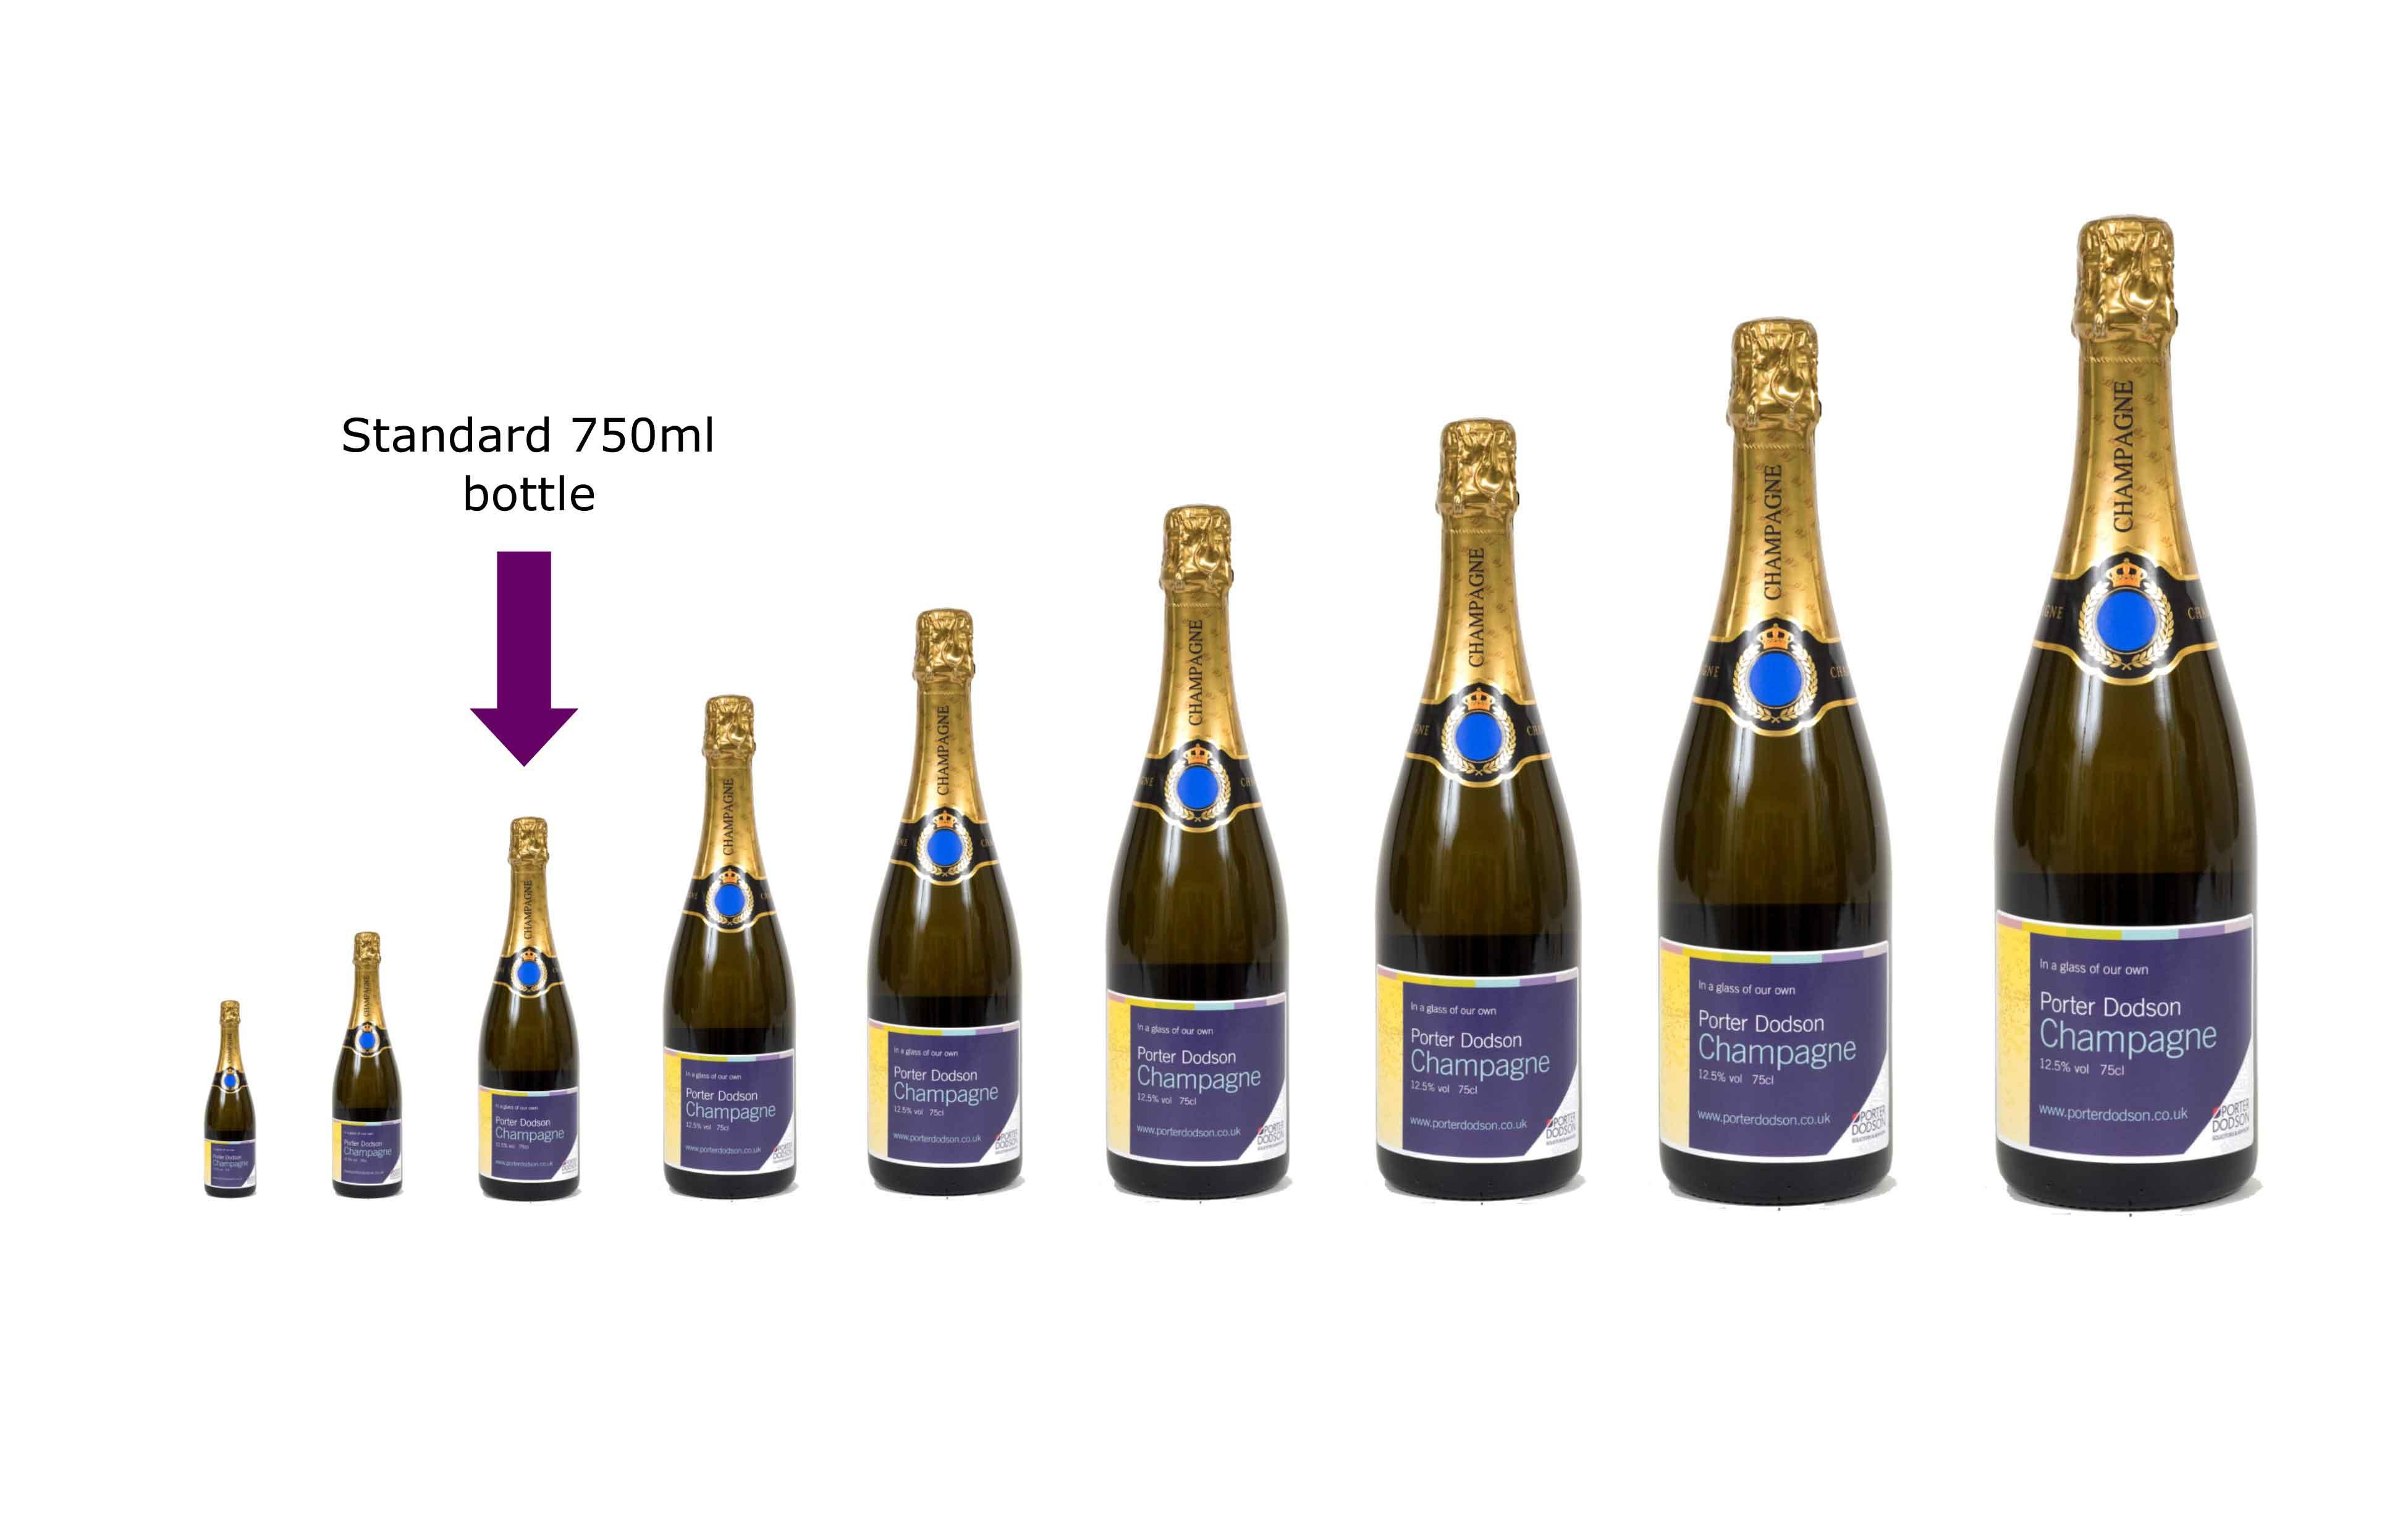 Champagne Bottle Sizes